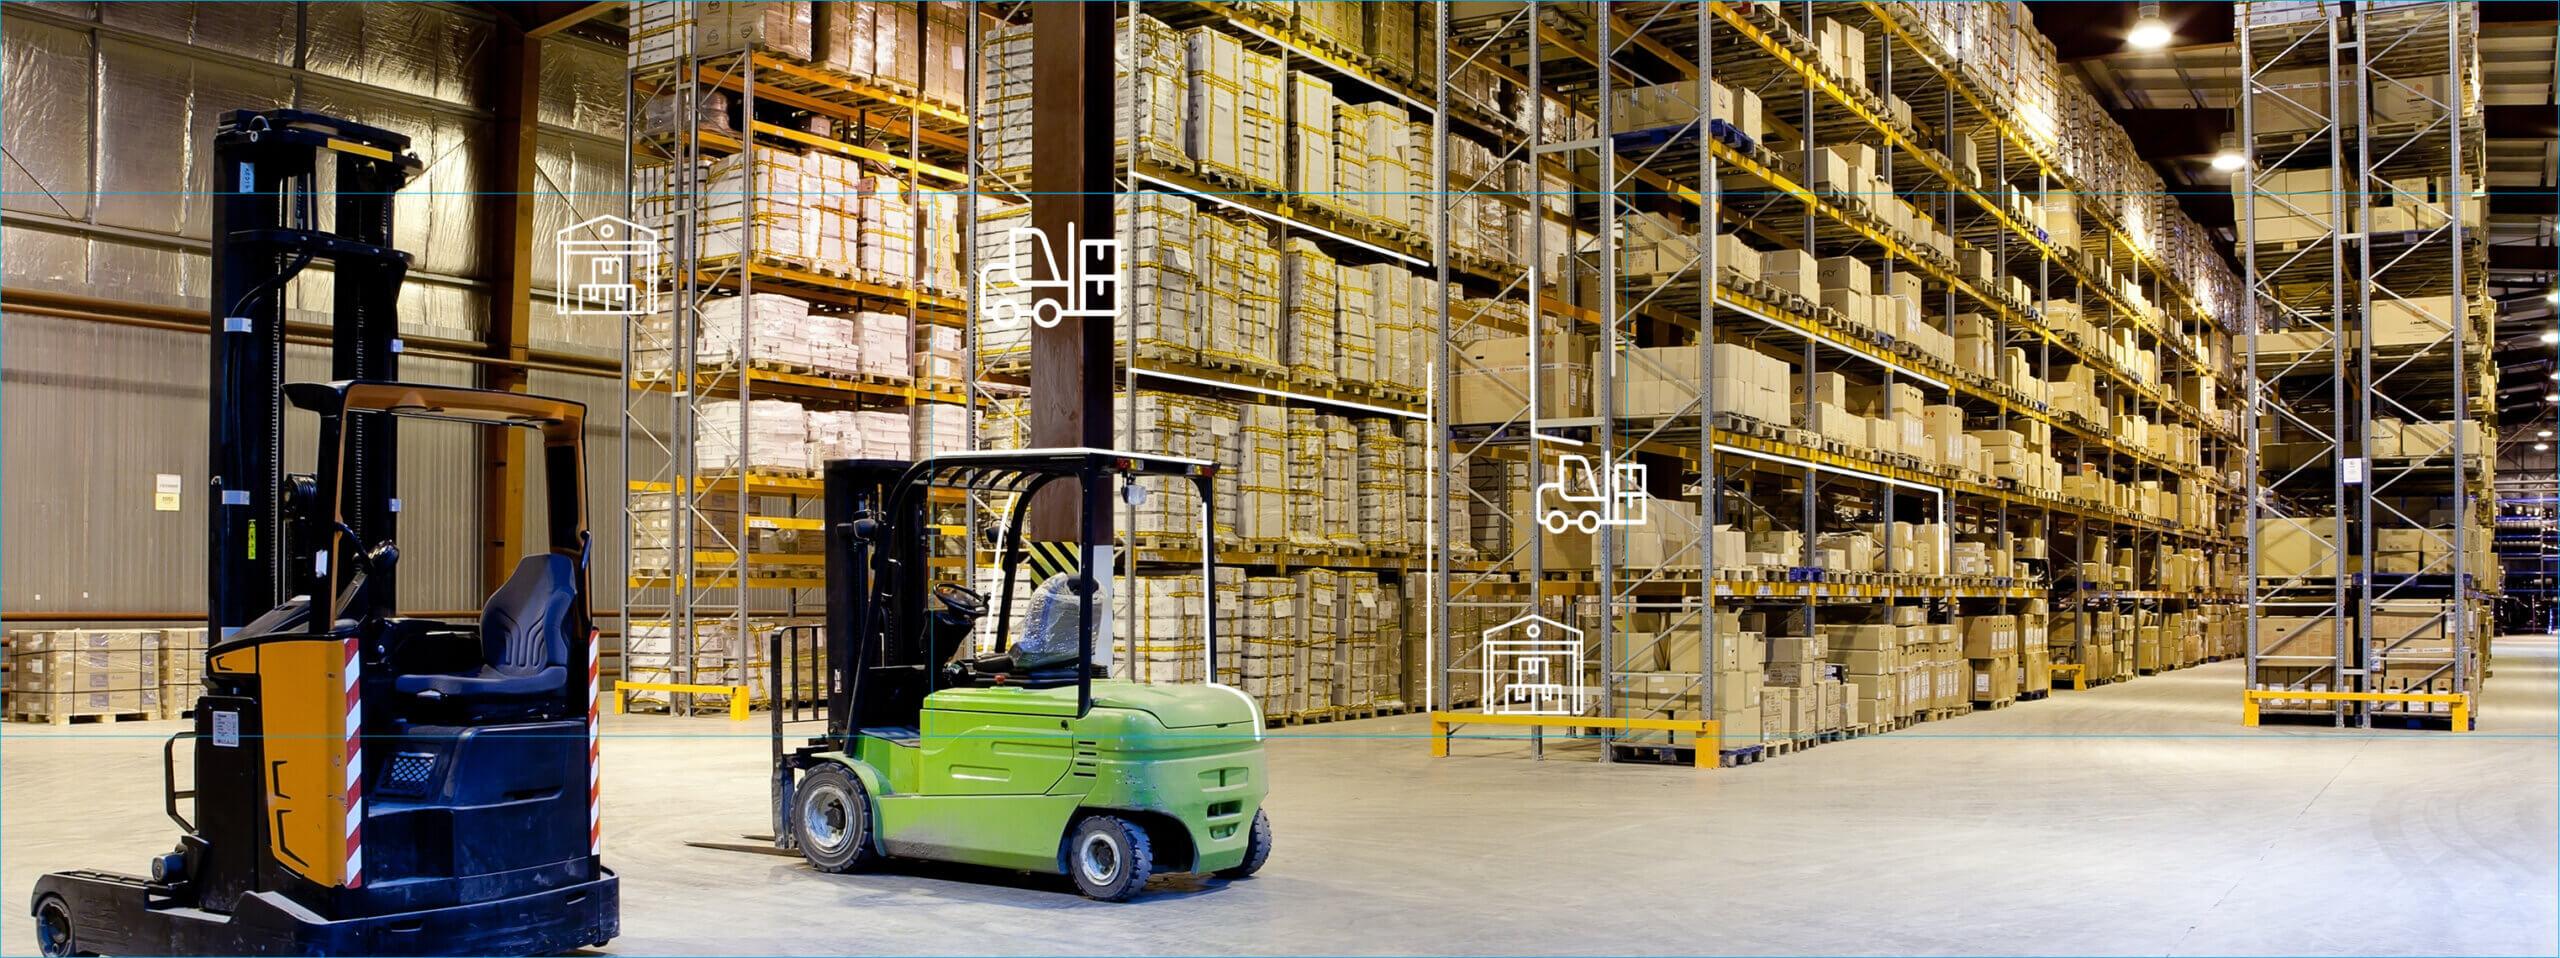 general warehouse license Dubai